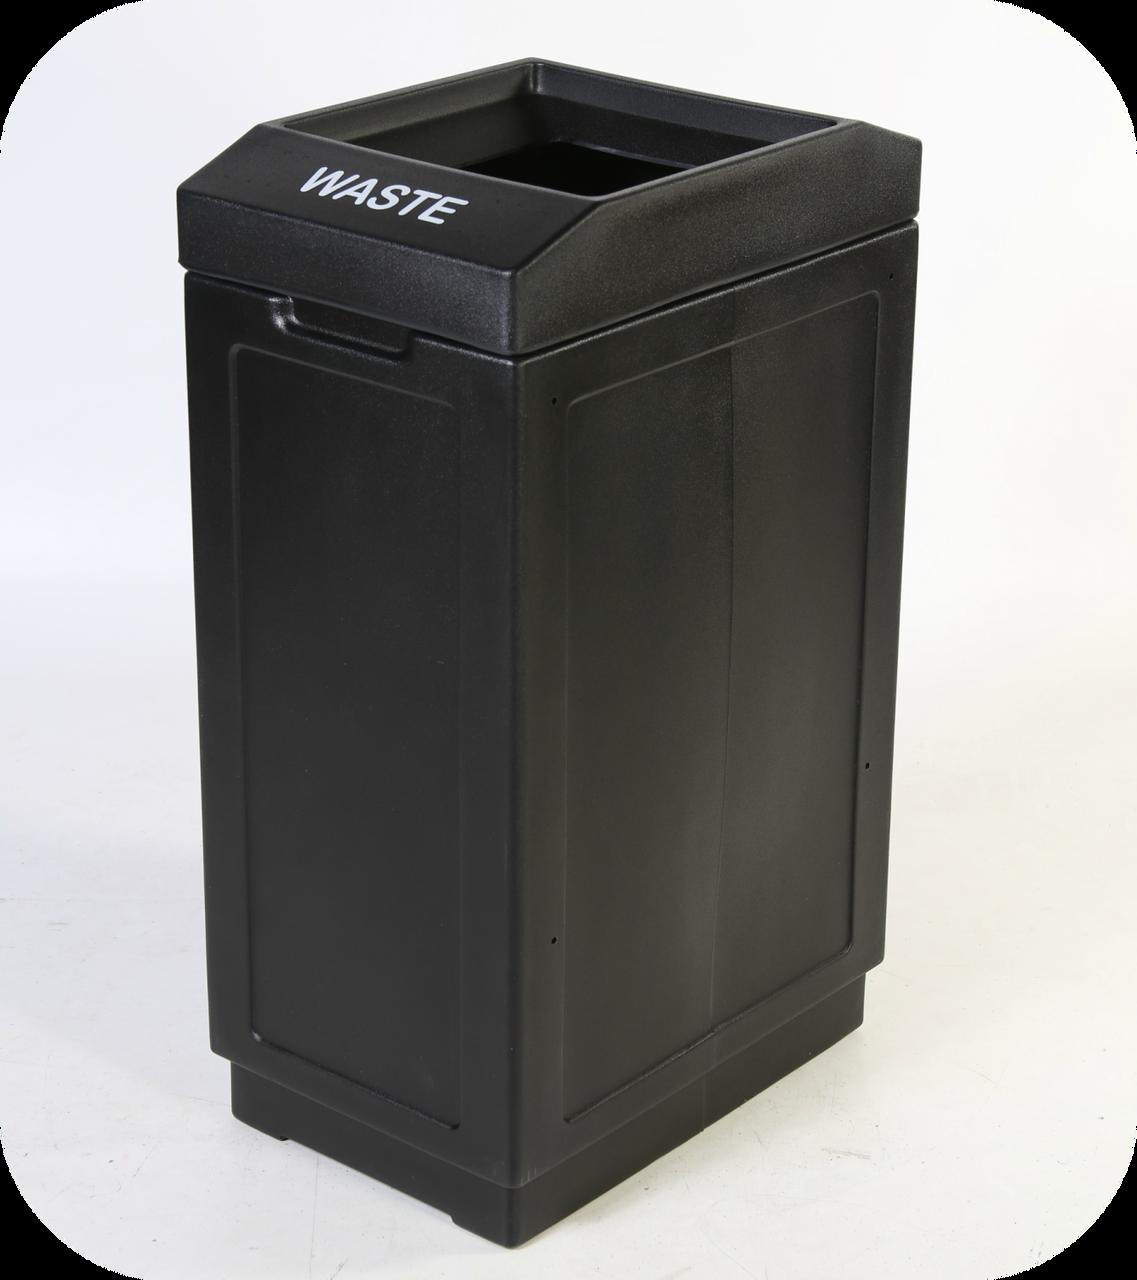 39 Gallon Indoor Outdoor Forte Plastic Waste Can Black